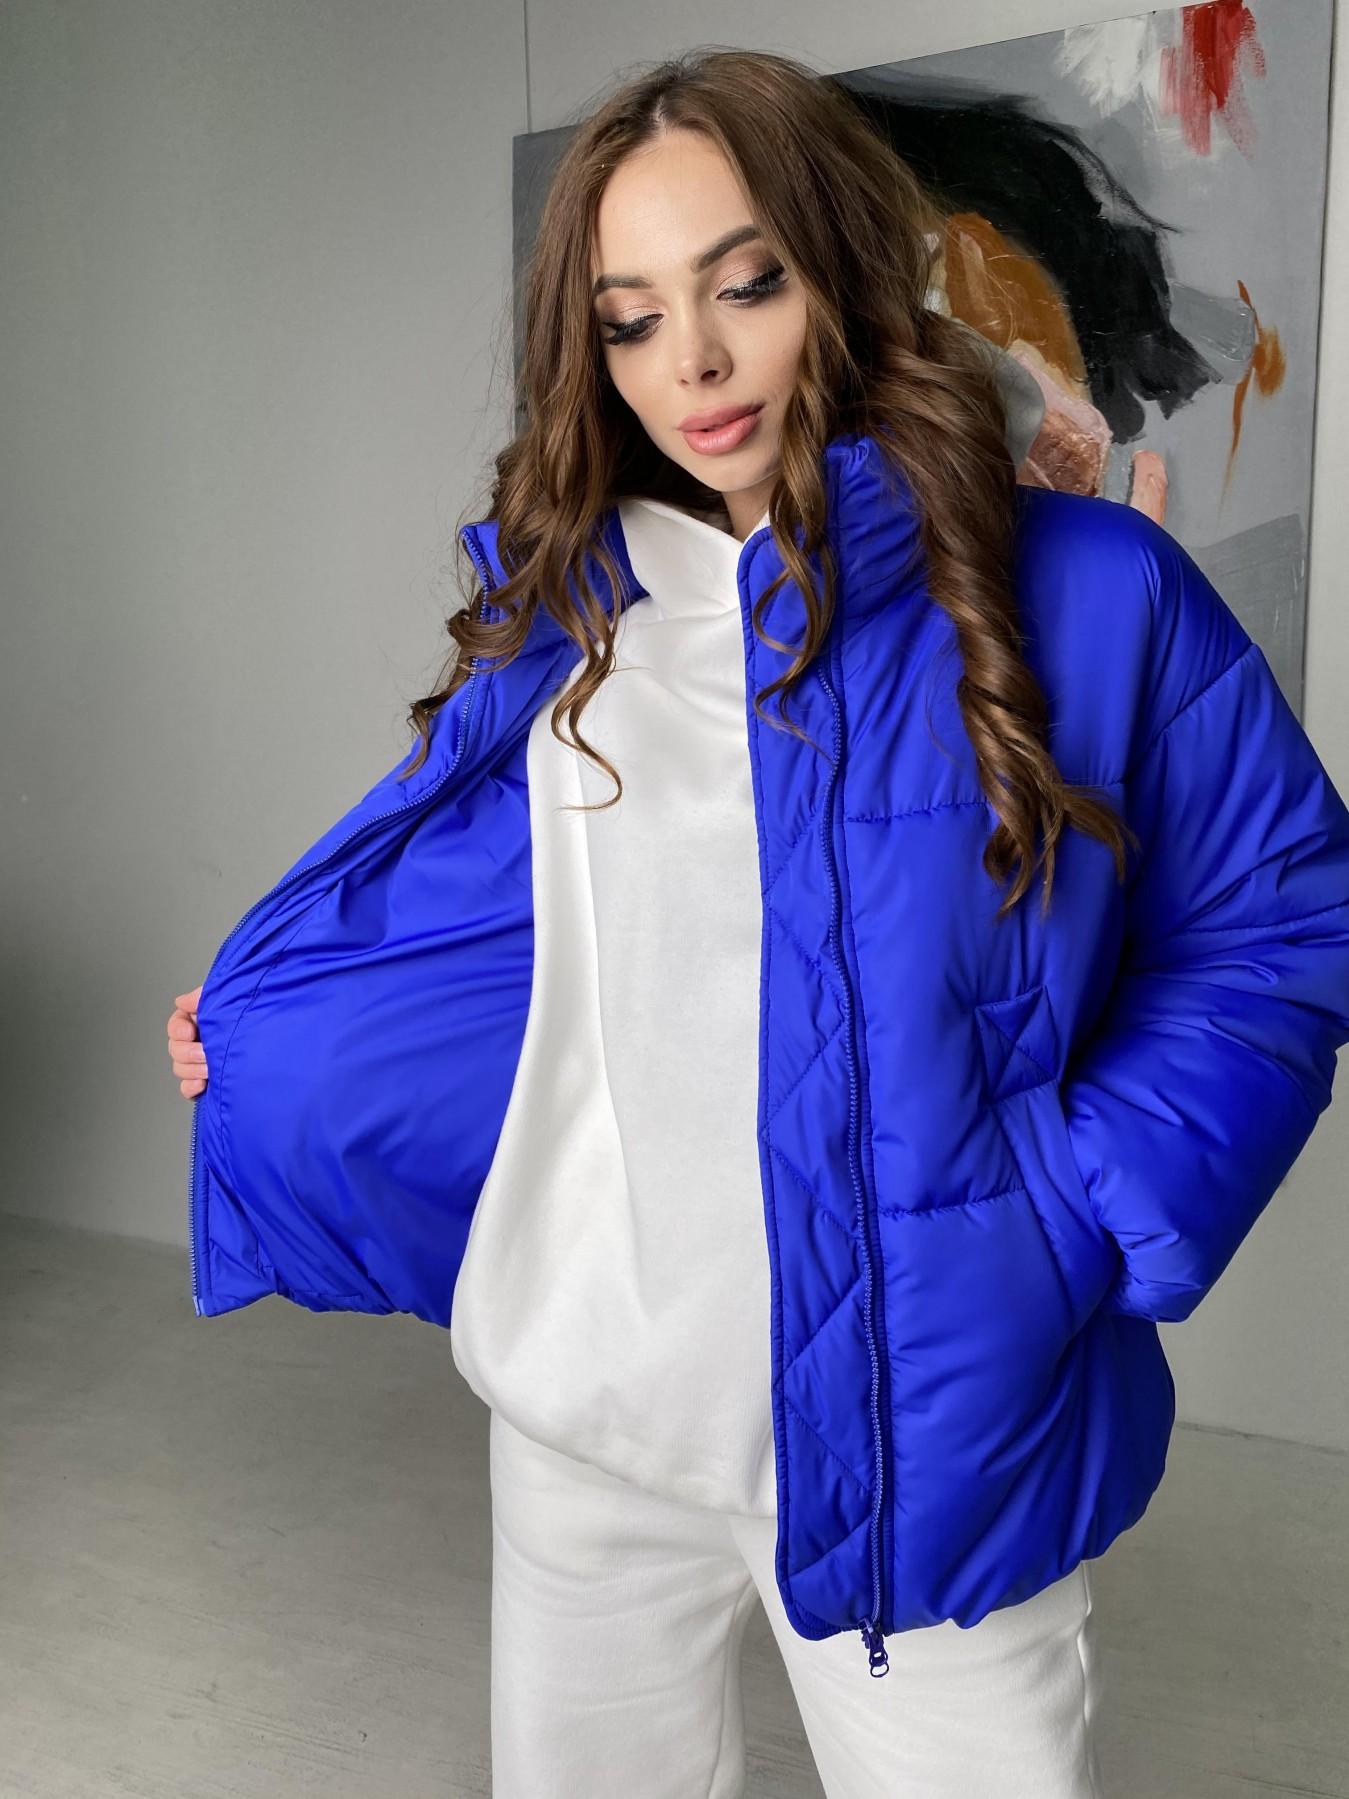 Муд куртка из плащевой ткани 10509 АРТ. 46852 Цвет: Электрик - фото 2, интернет магазин tm-modus.ru